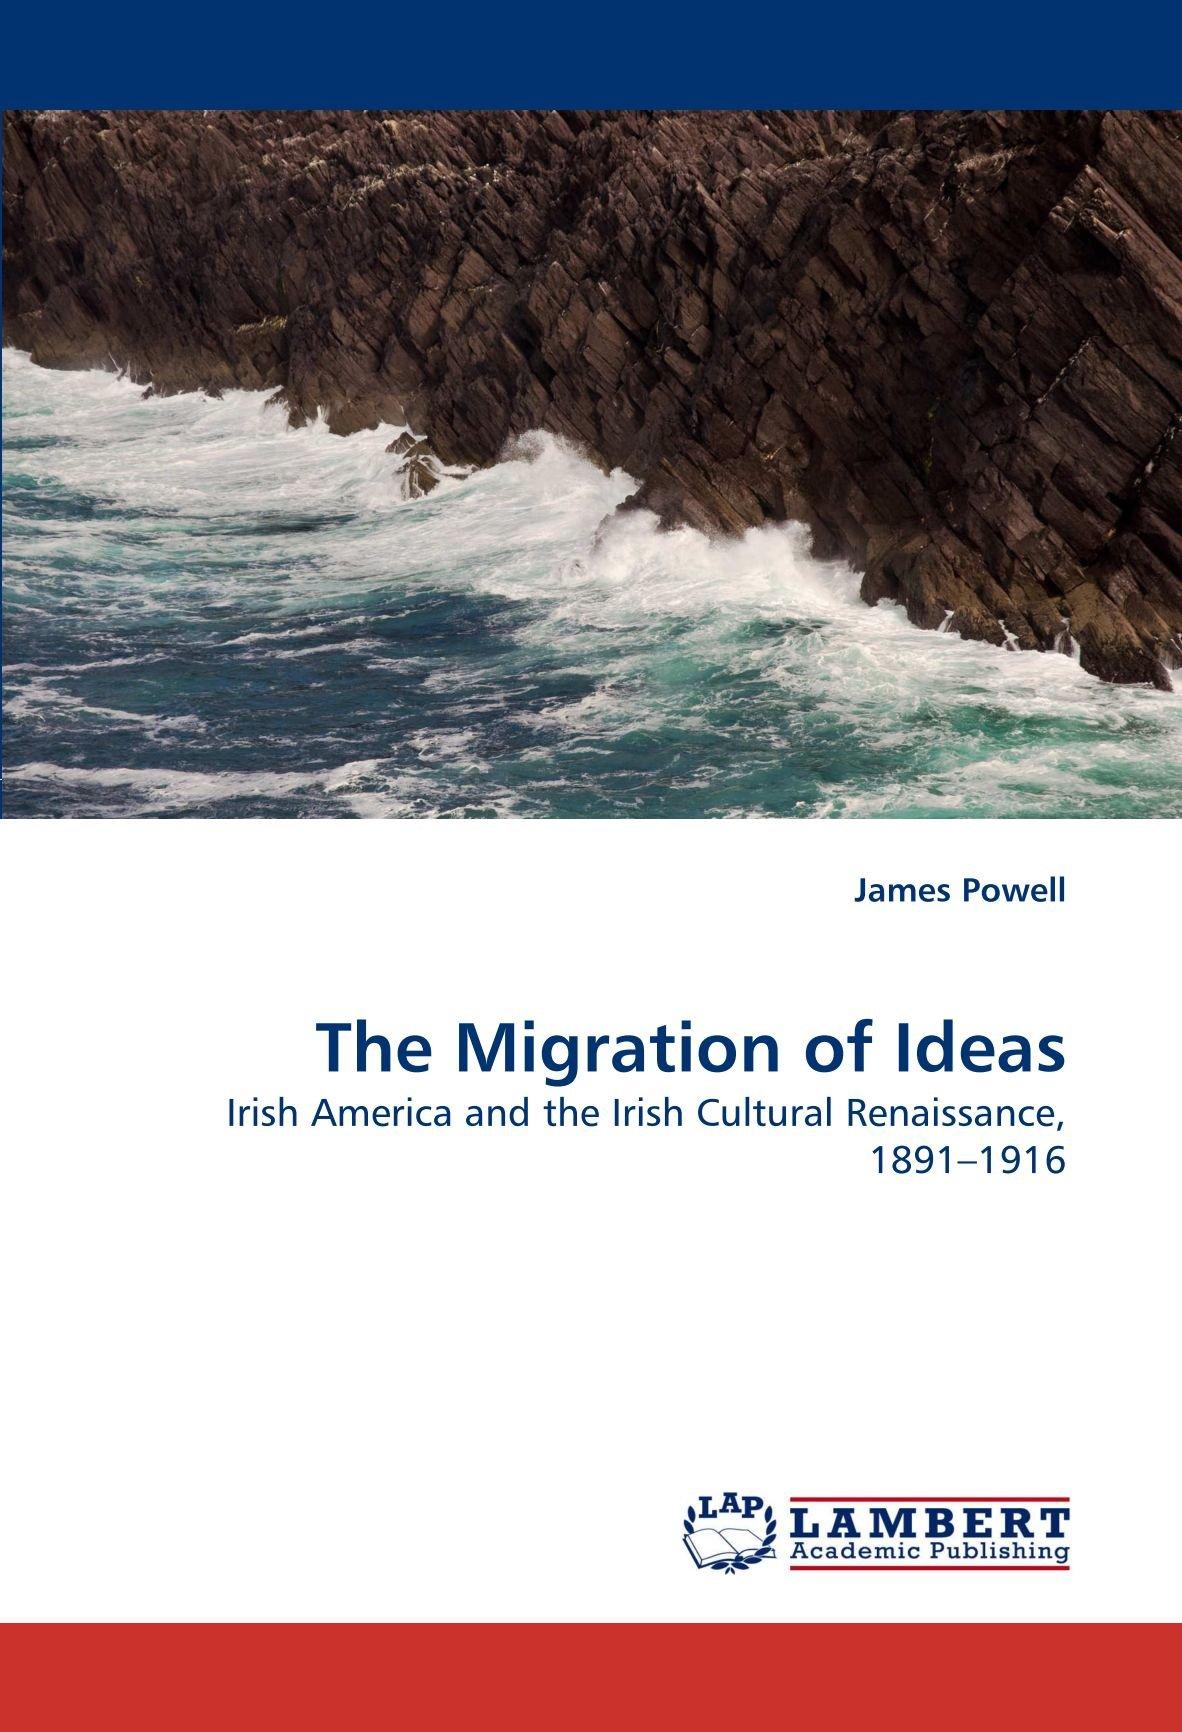 The Migration of Ideas: Irish America and the Irish Cultural